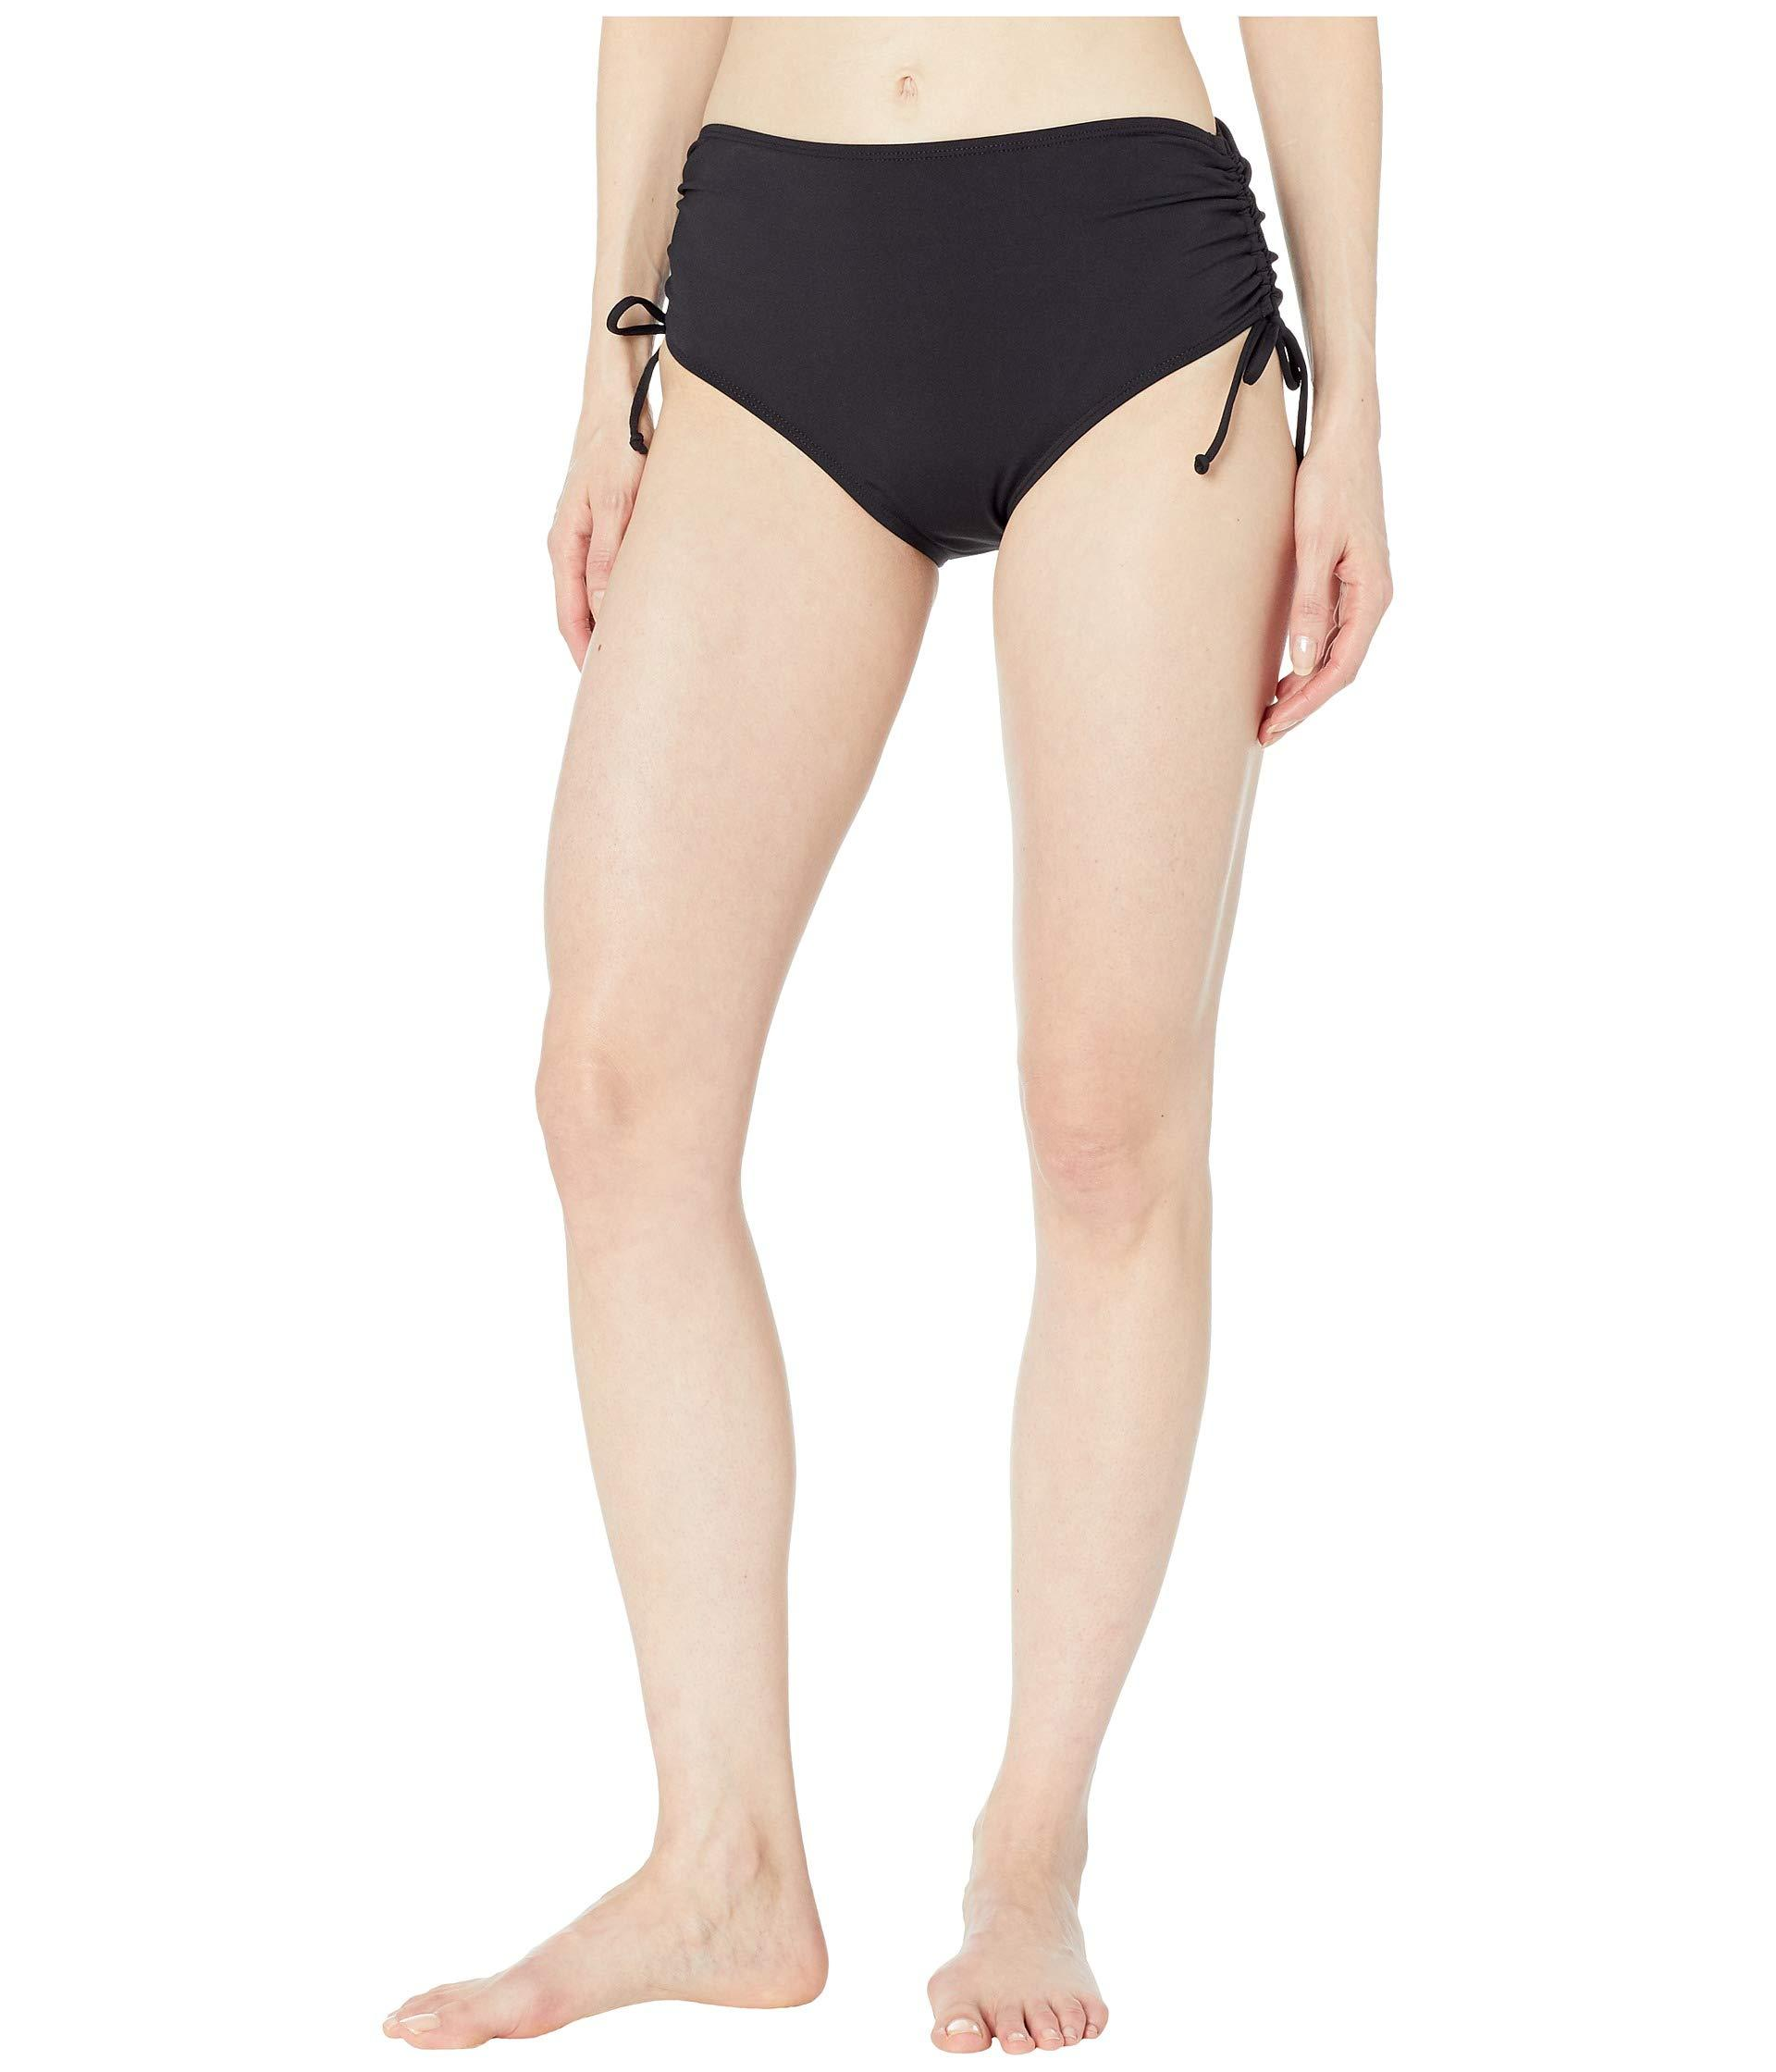 de4d0041474 24th   Ocean. Solids Mid Waist Adjustable Tie Side Pant Bottoms ...